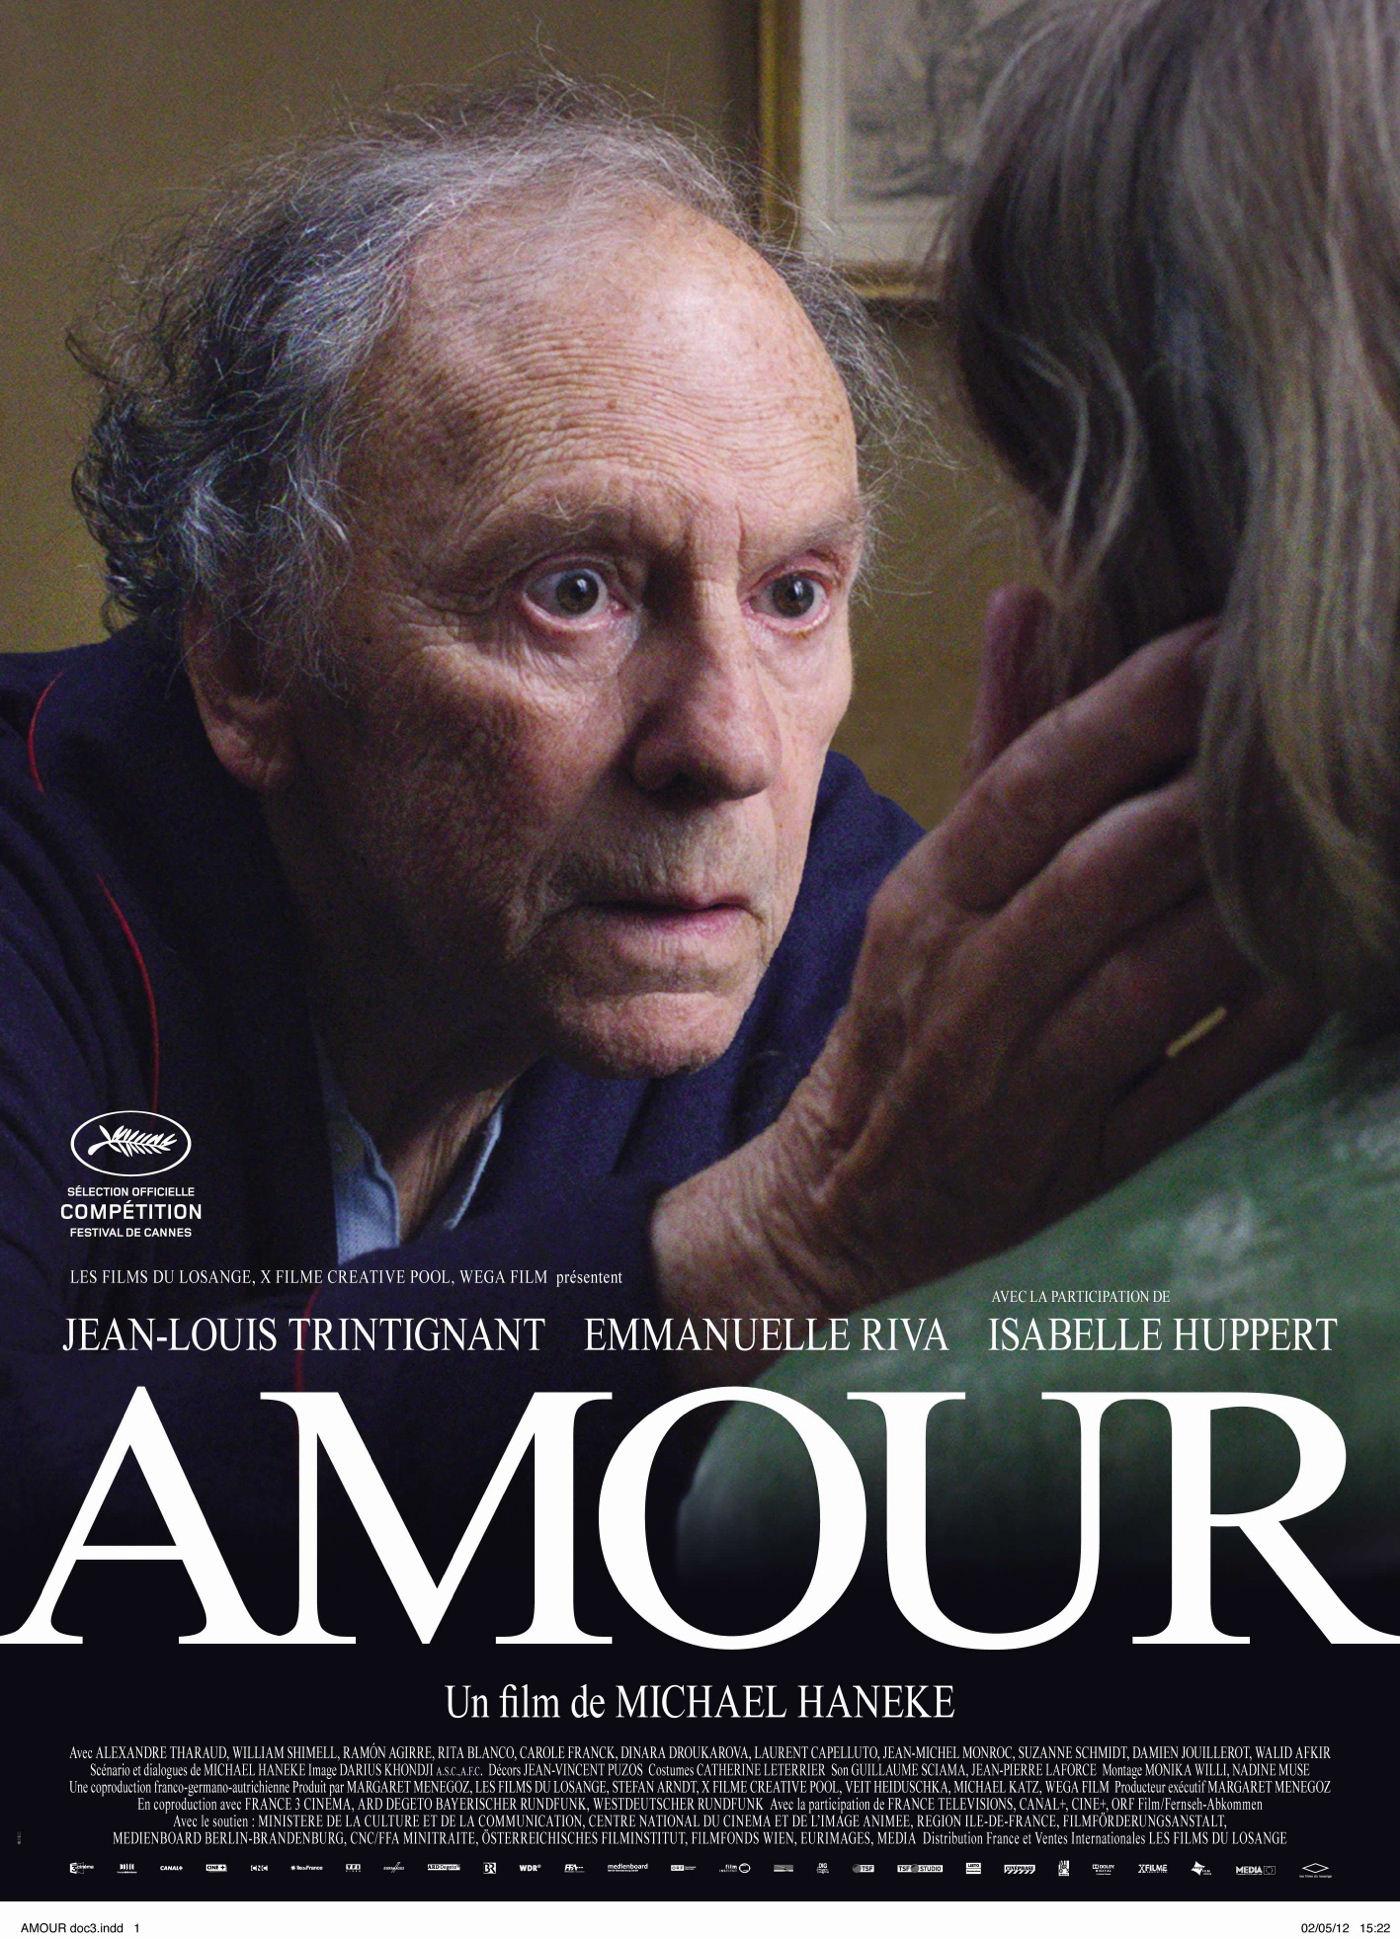 Amour 2012 movie